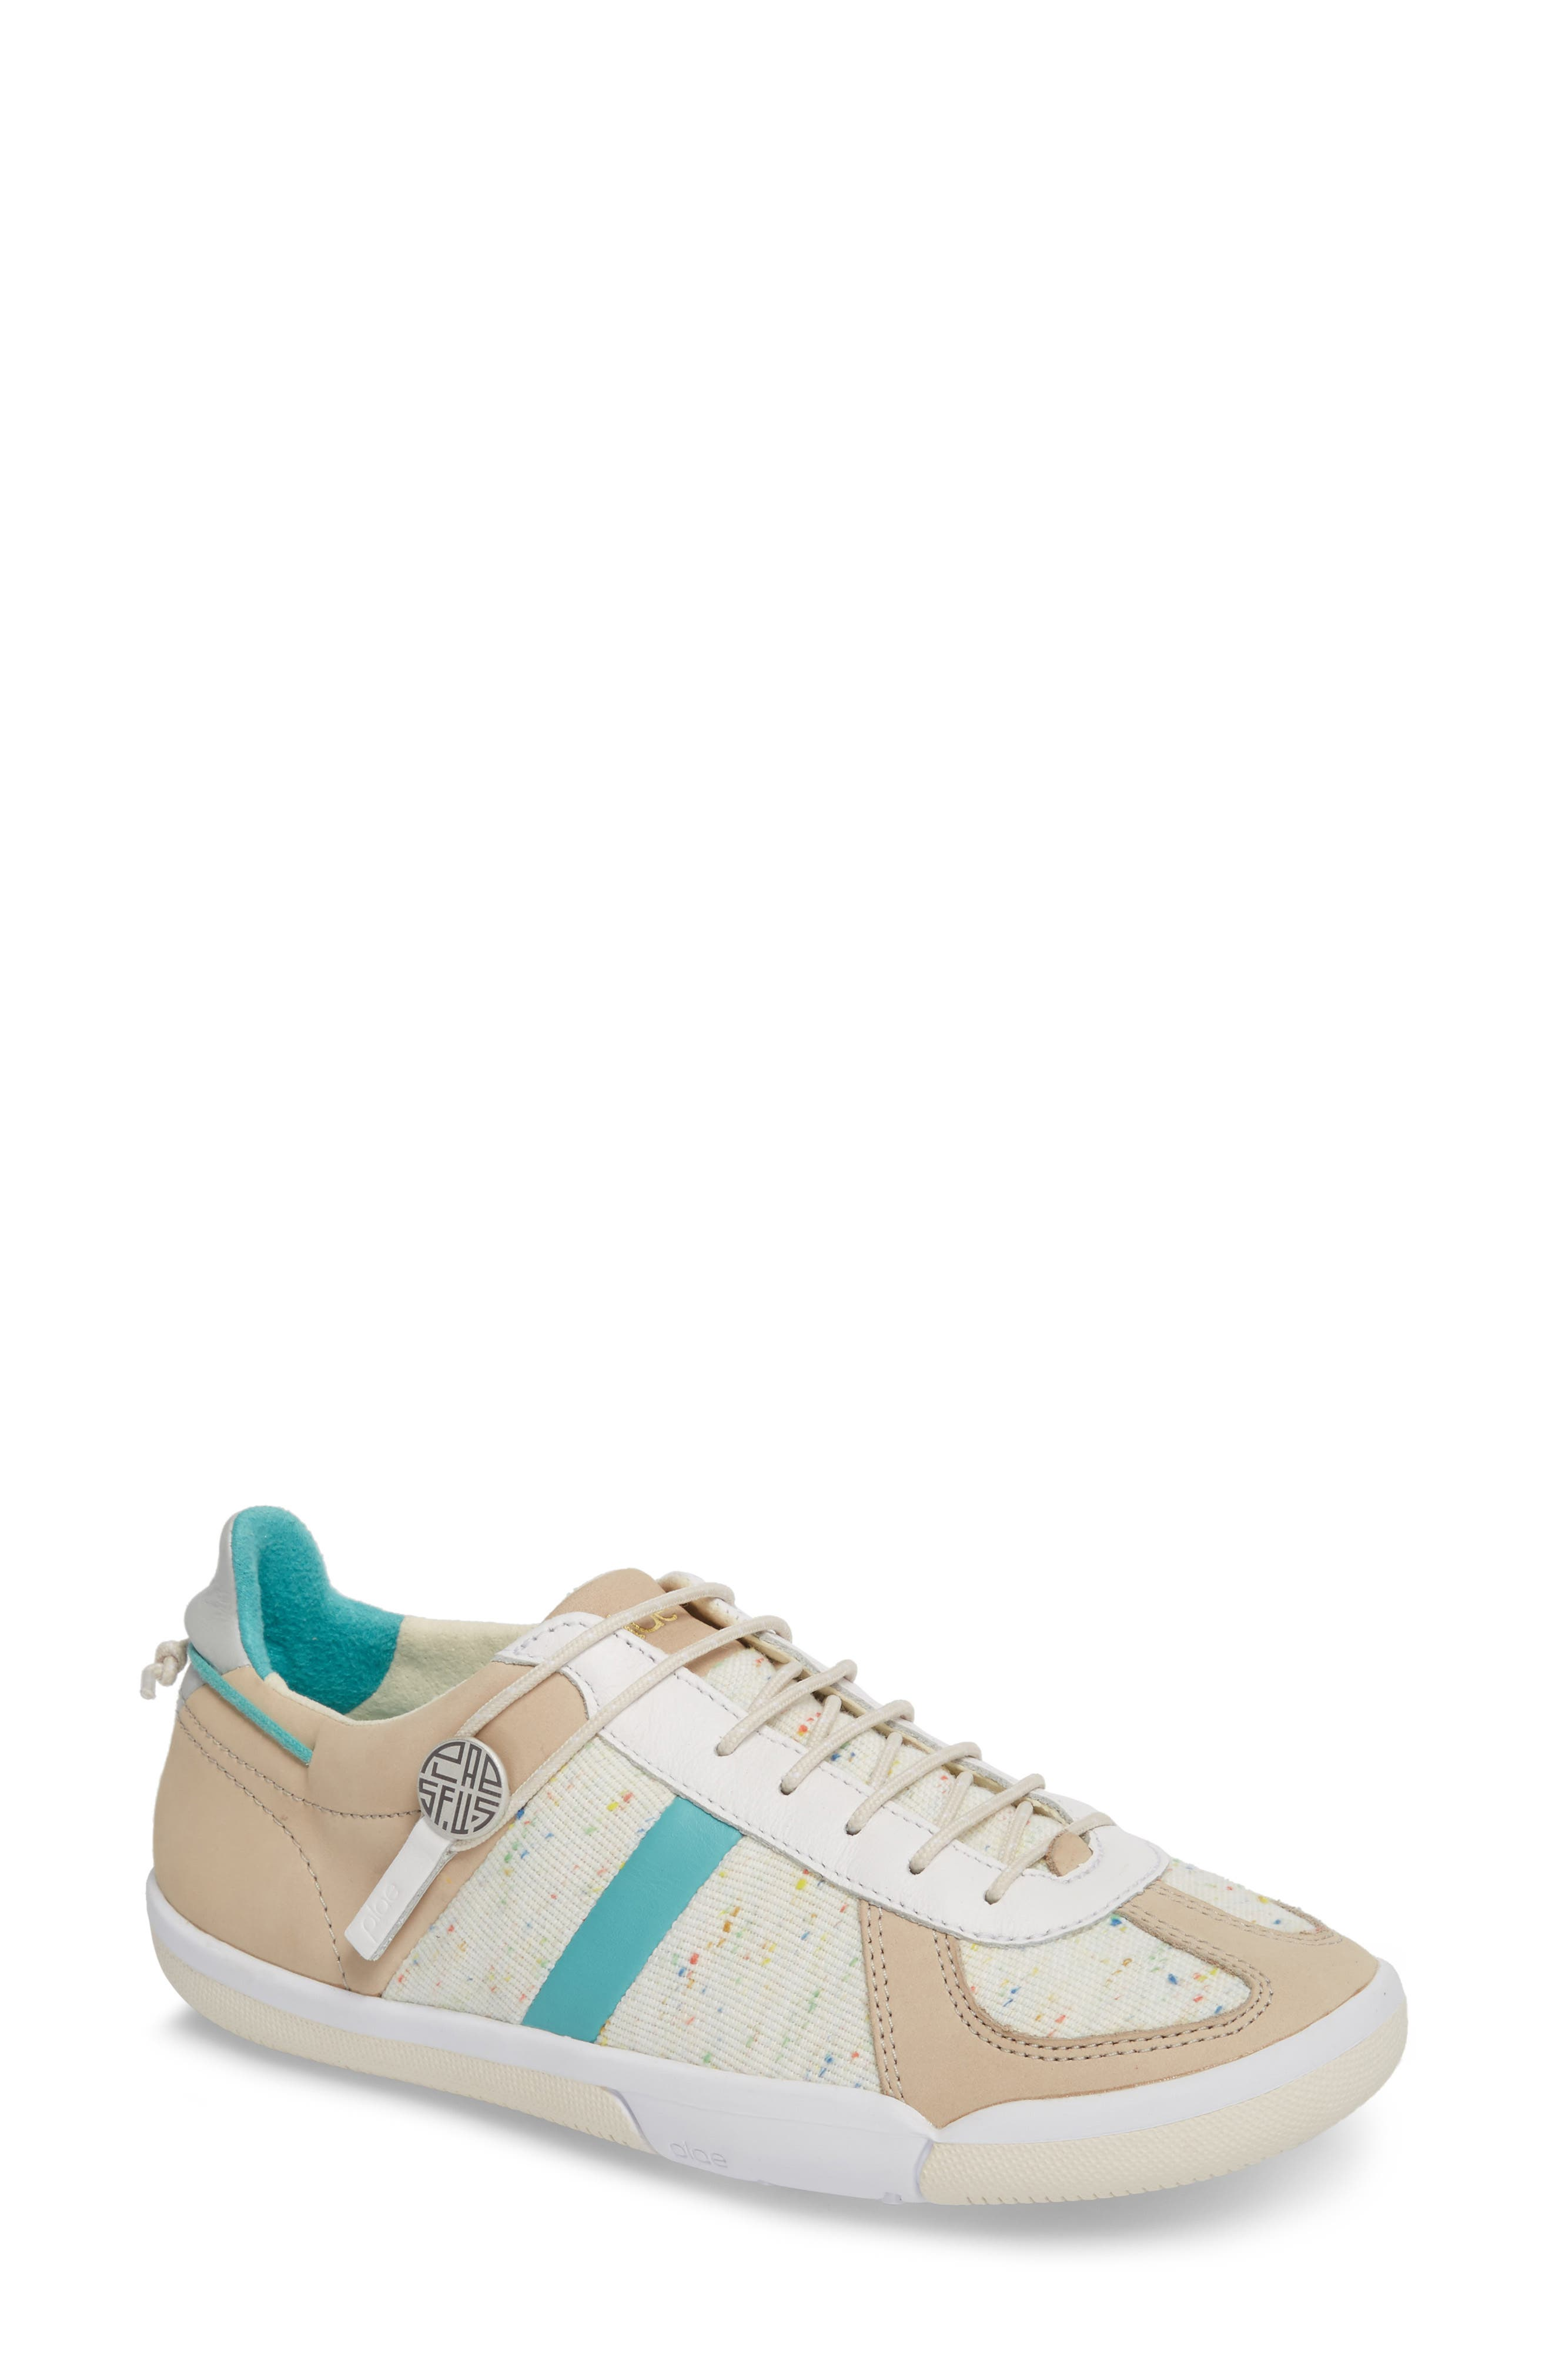 Butler Sneaker,                             Main thumbnail 1, color,                             Turtledove Leather